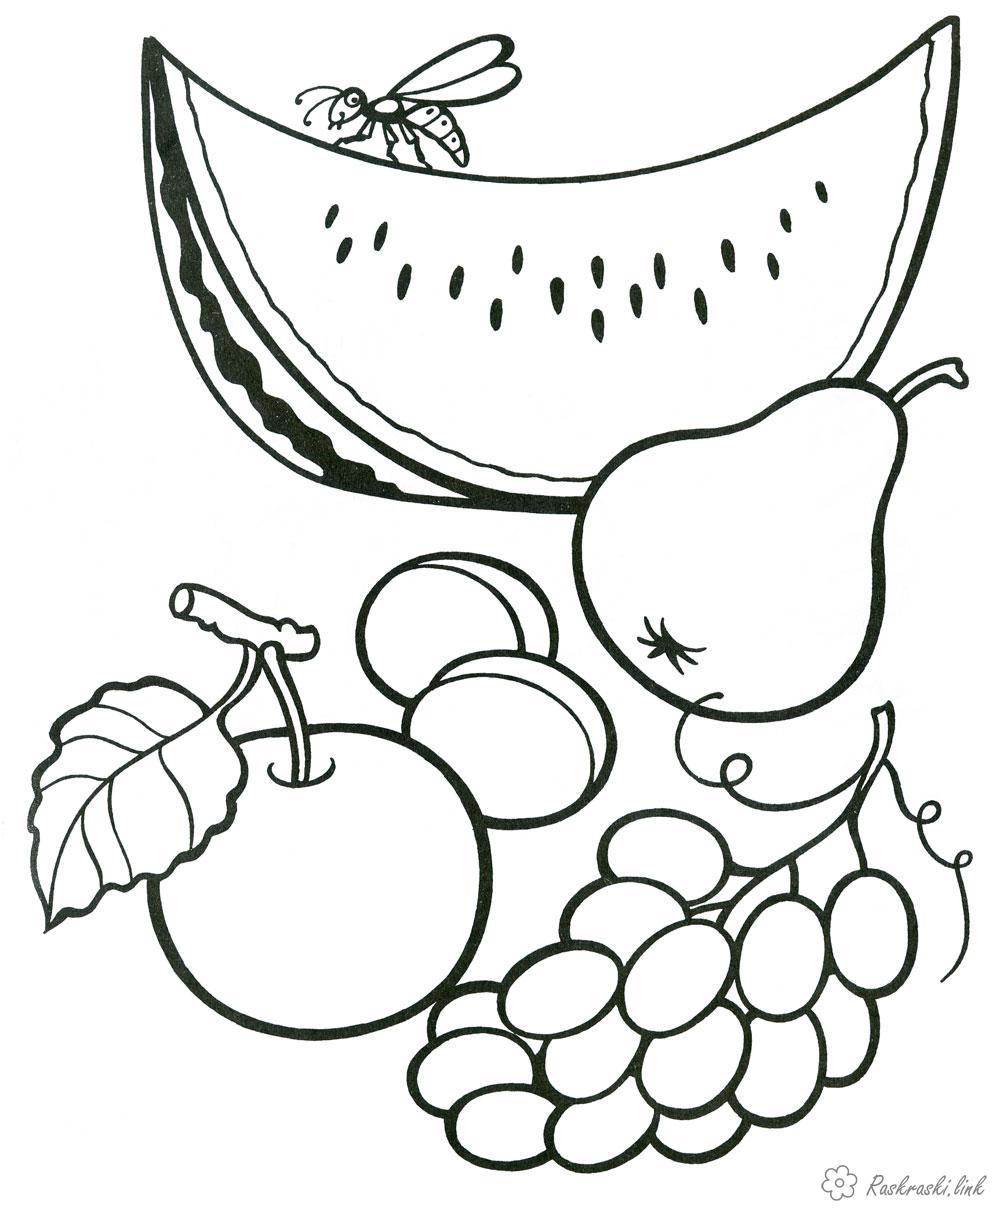 Розмальовки Фрукти  розмальовки фрукти, для дітей, роздрукувати, онлайн